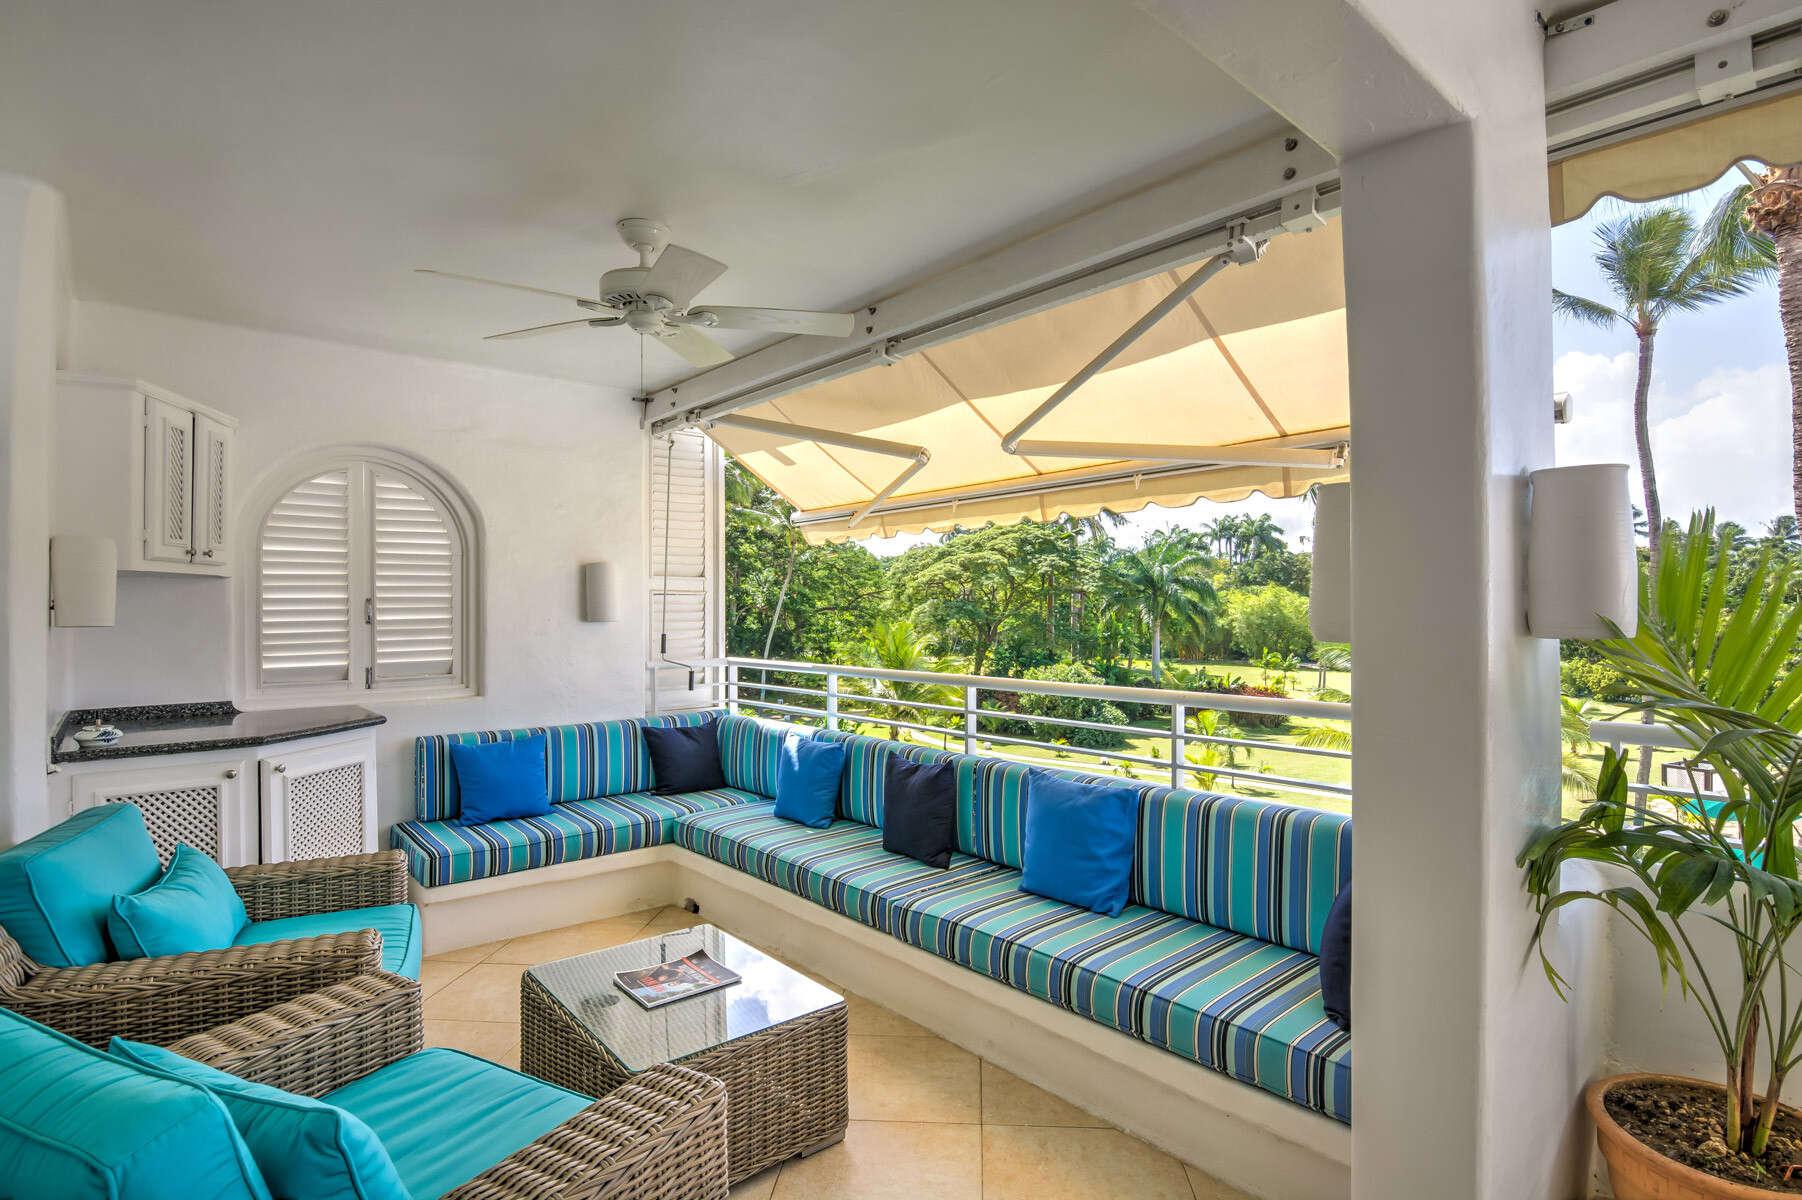 Luxury villa rentals caribbean - Barbados - St james - Porters - Glitter Bay 309 | Sea Breeze - Image 1/10